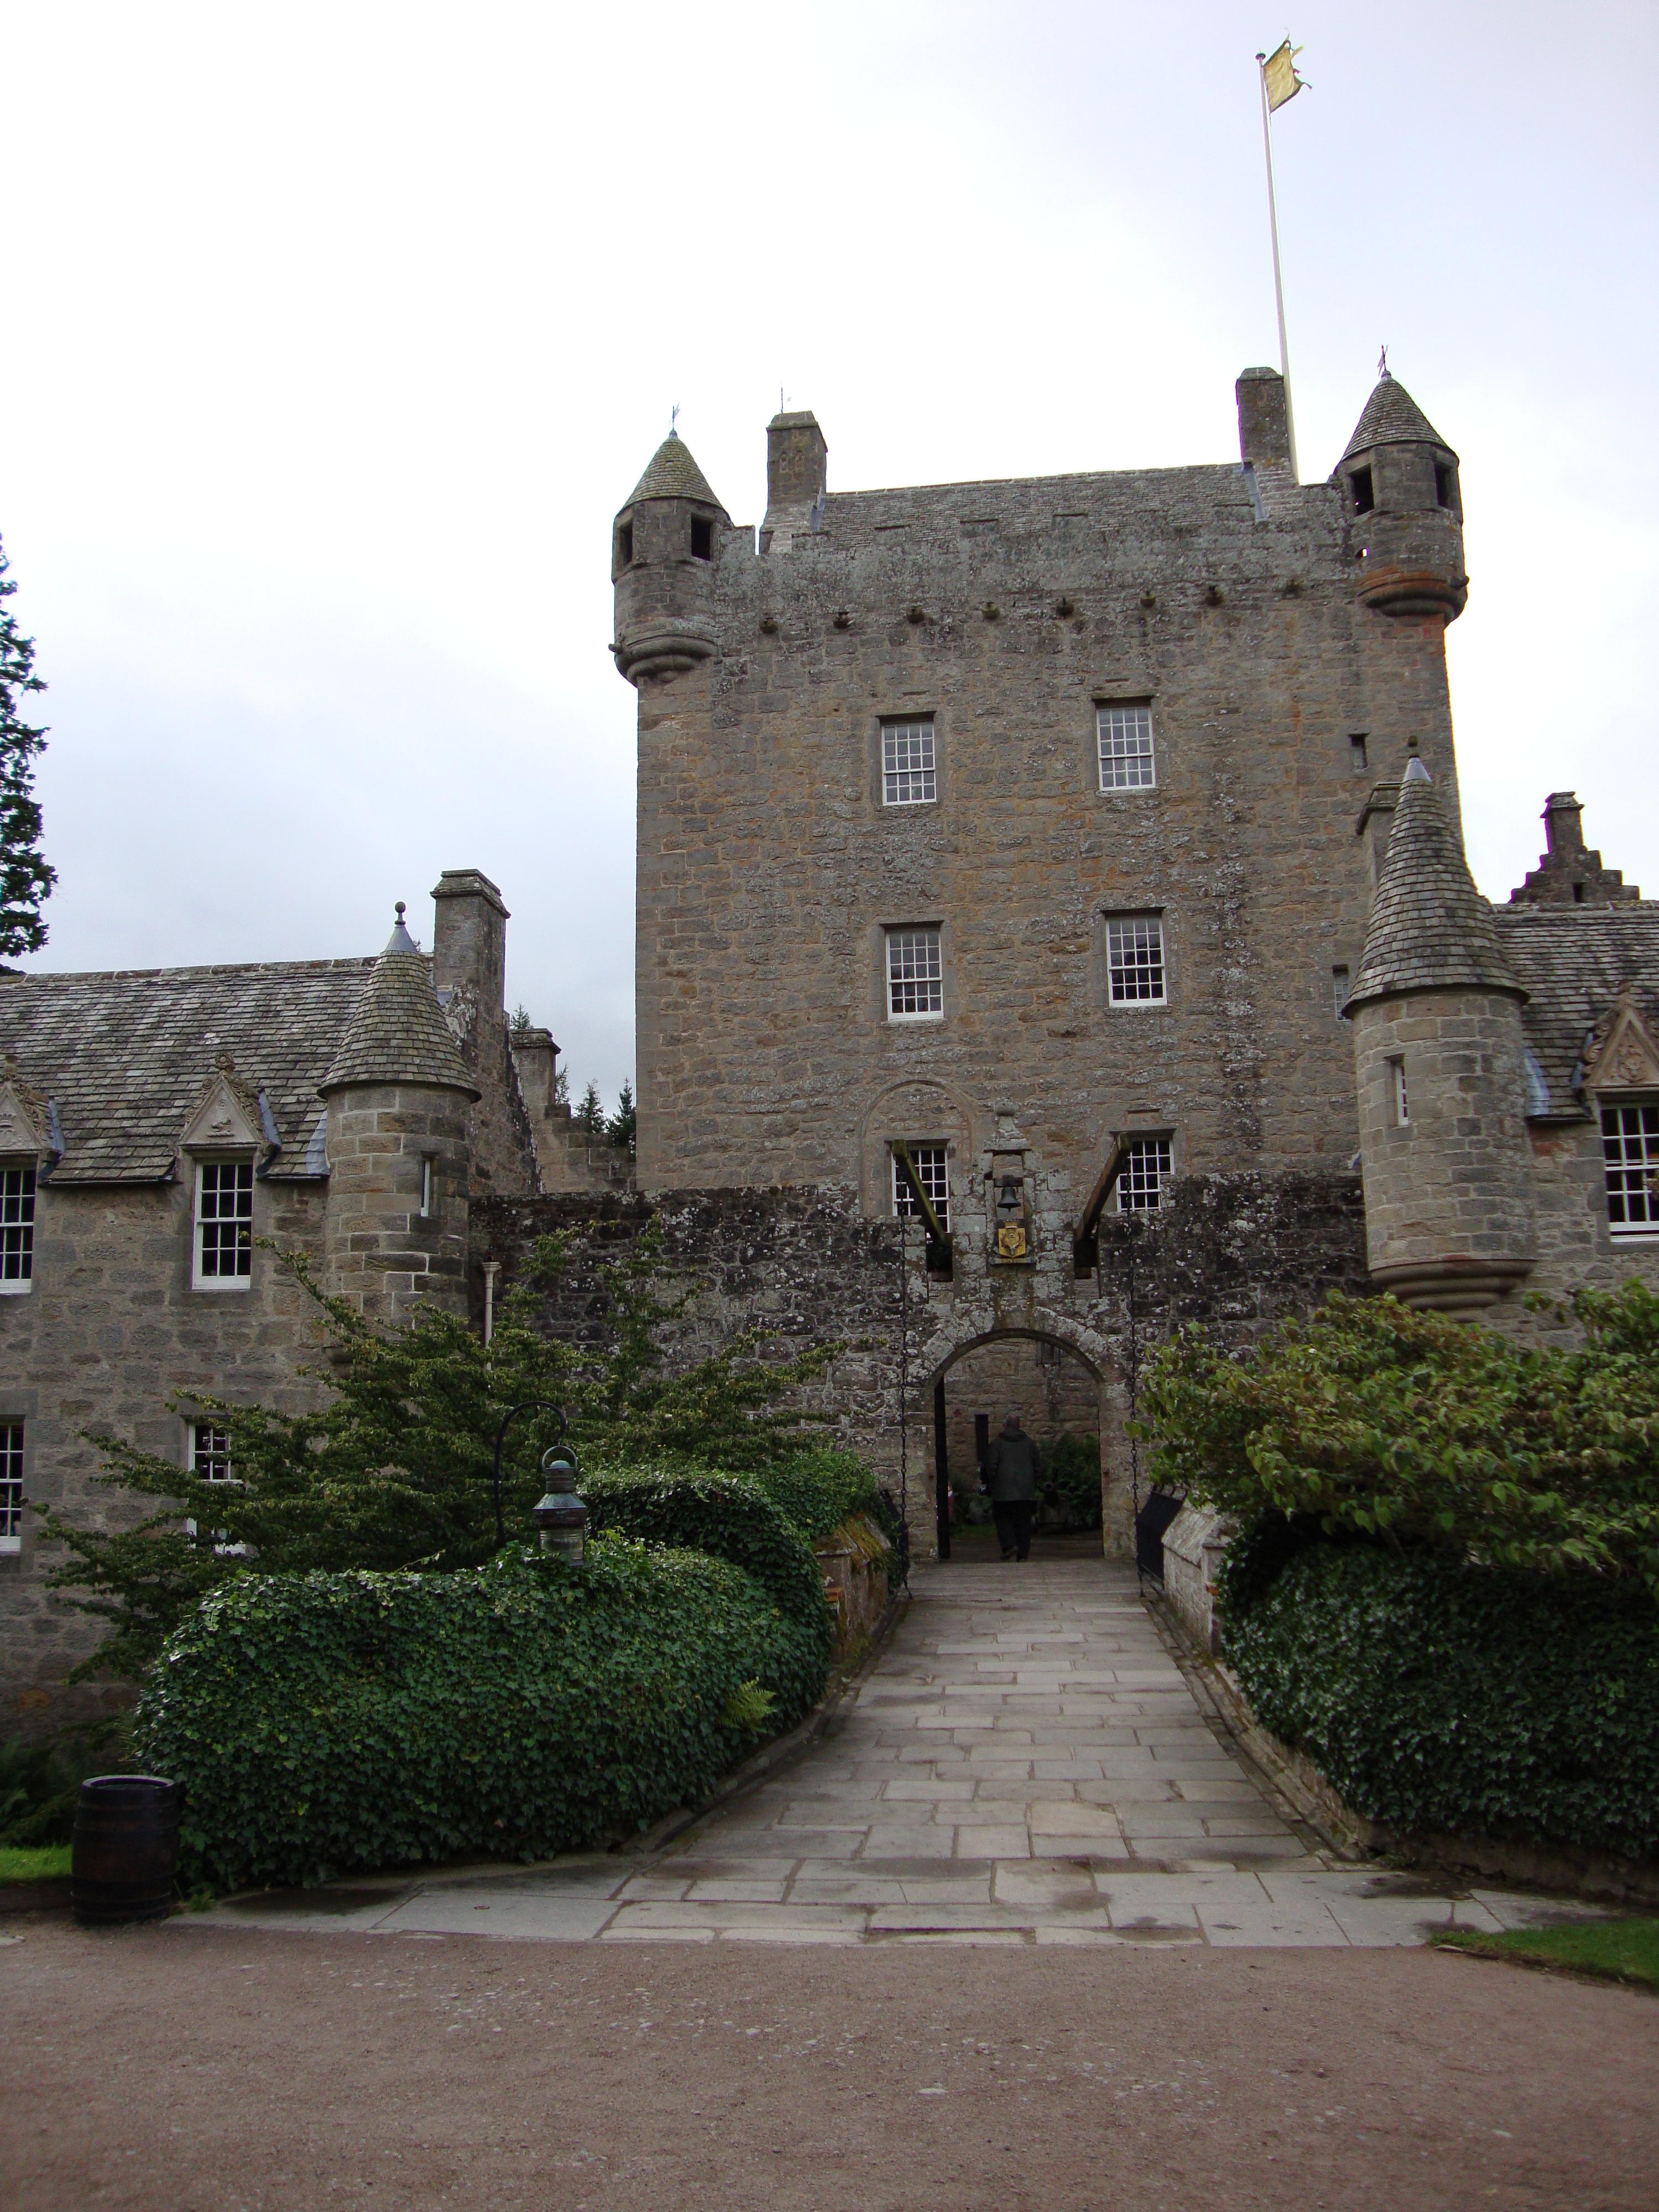 The Cawdor Theatre